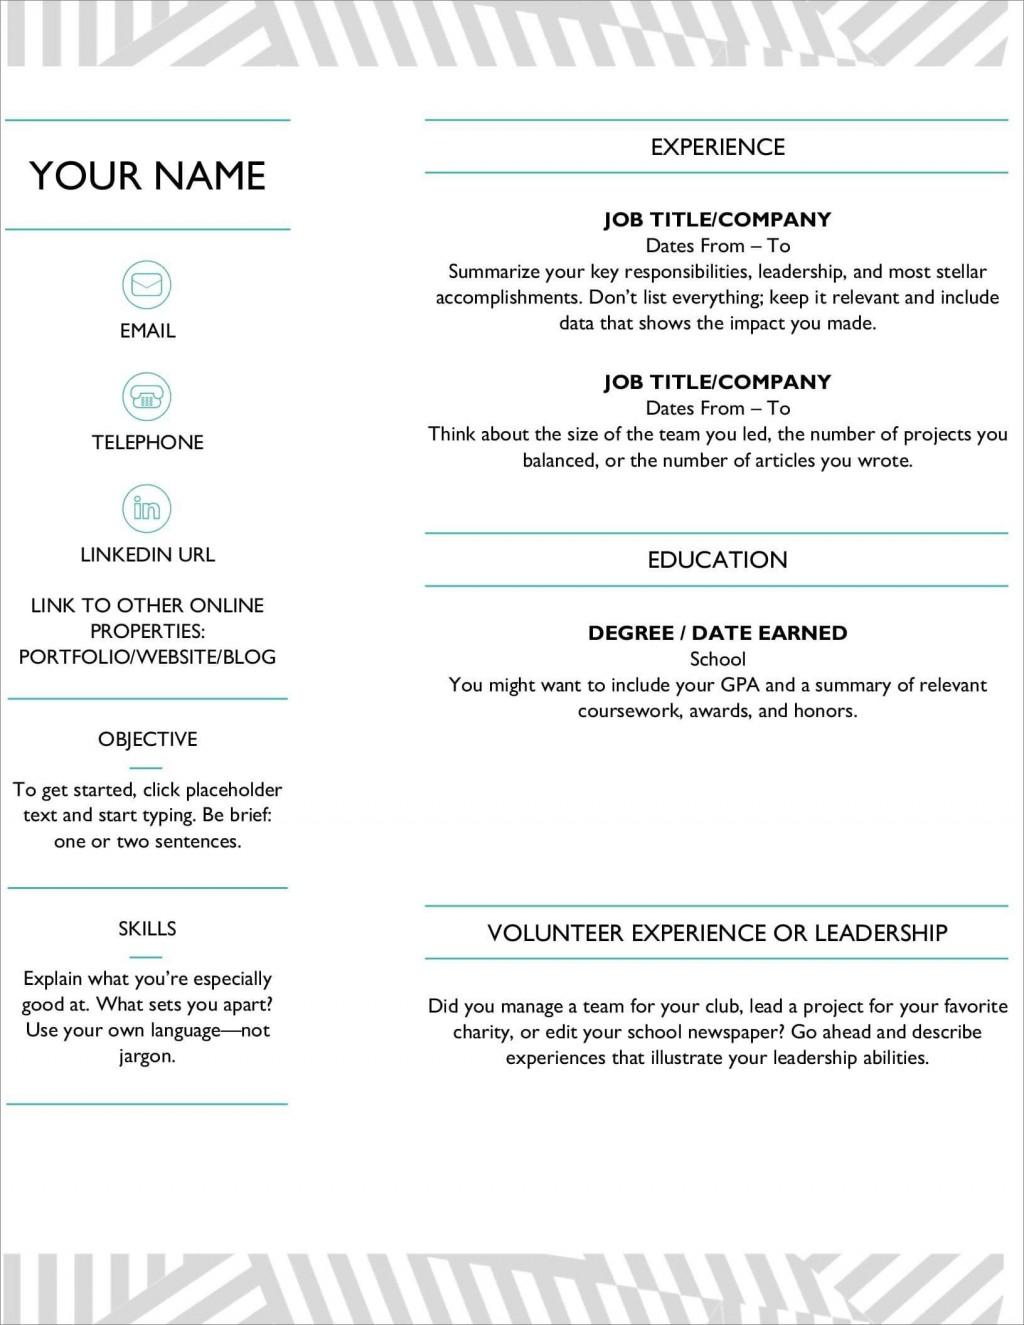 006 Marvelou Resume Microsoft Word Template Highest Clarity  Cv/resume Design Tutorial With Federal DownloadLarge